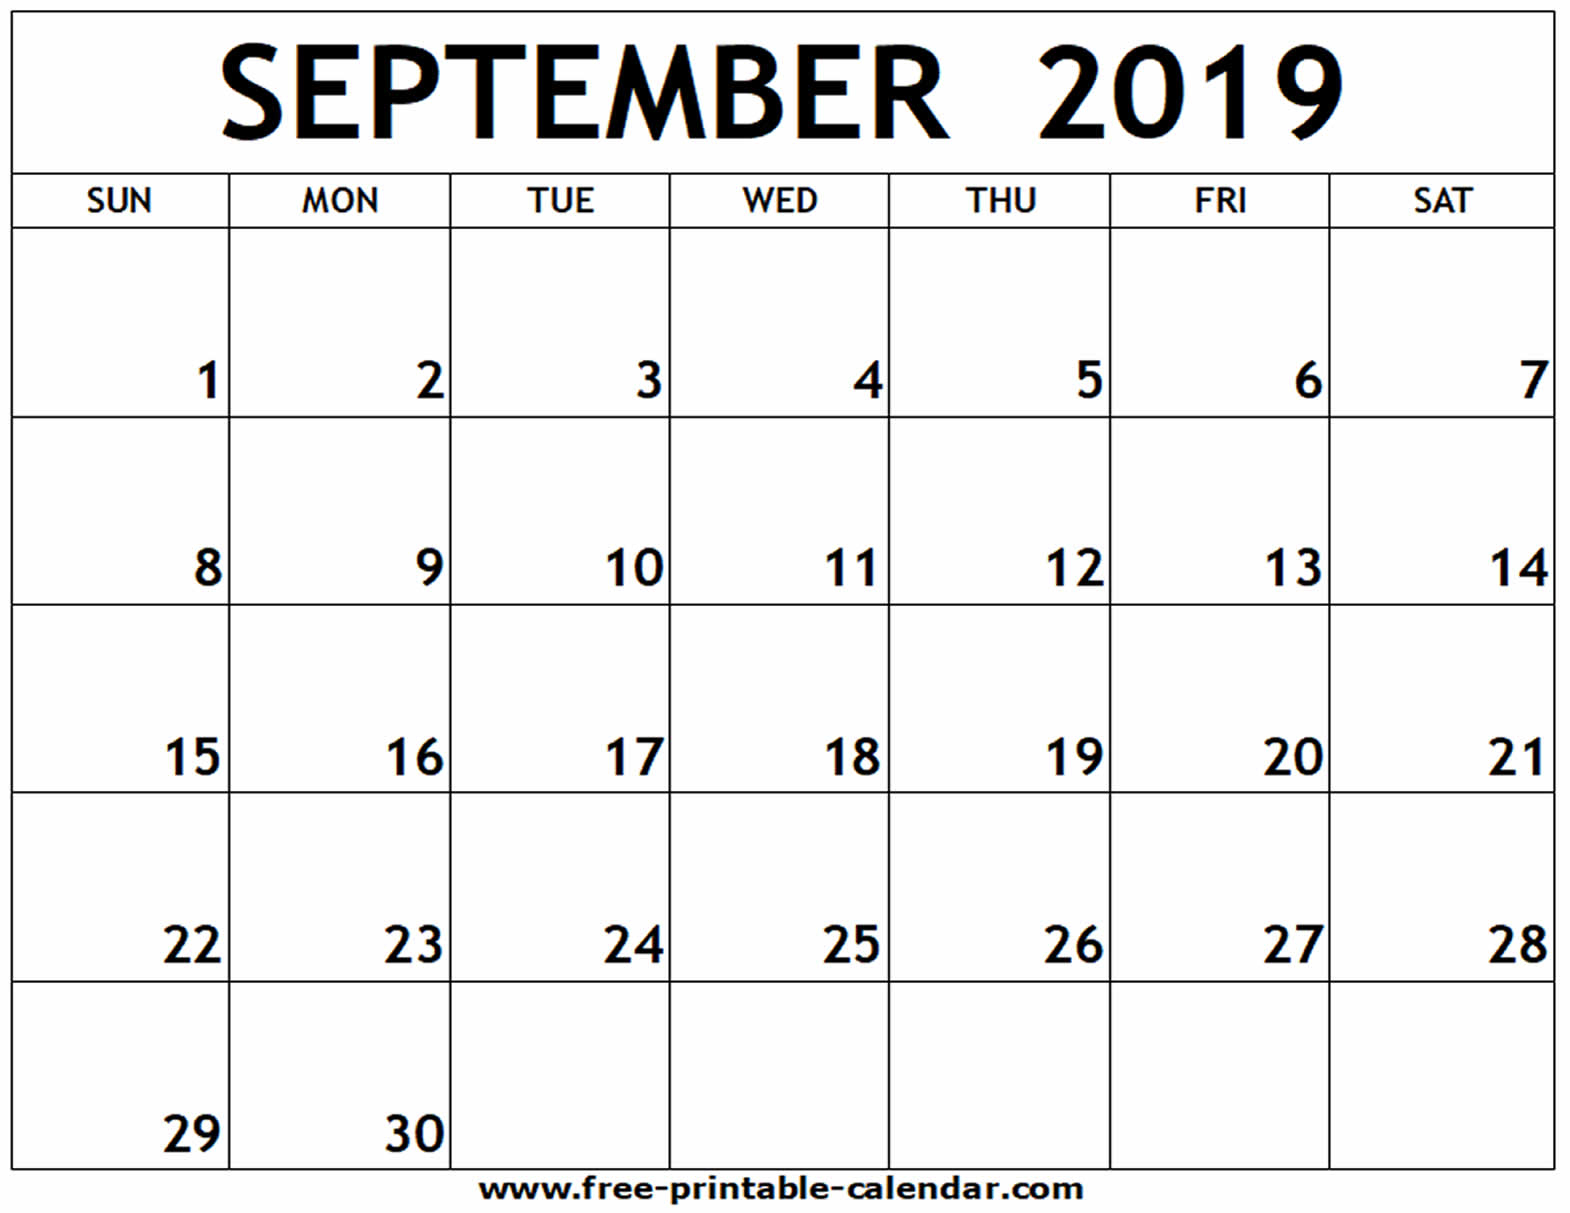 September 2019 Printable Calendar - Free-Printable-Calendar with Blank Calendars September Printable